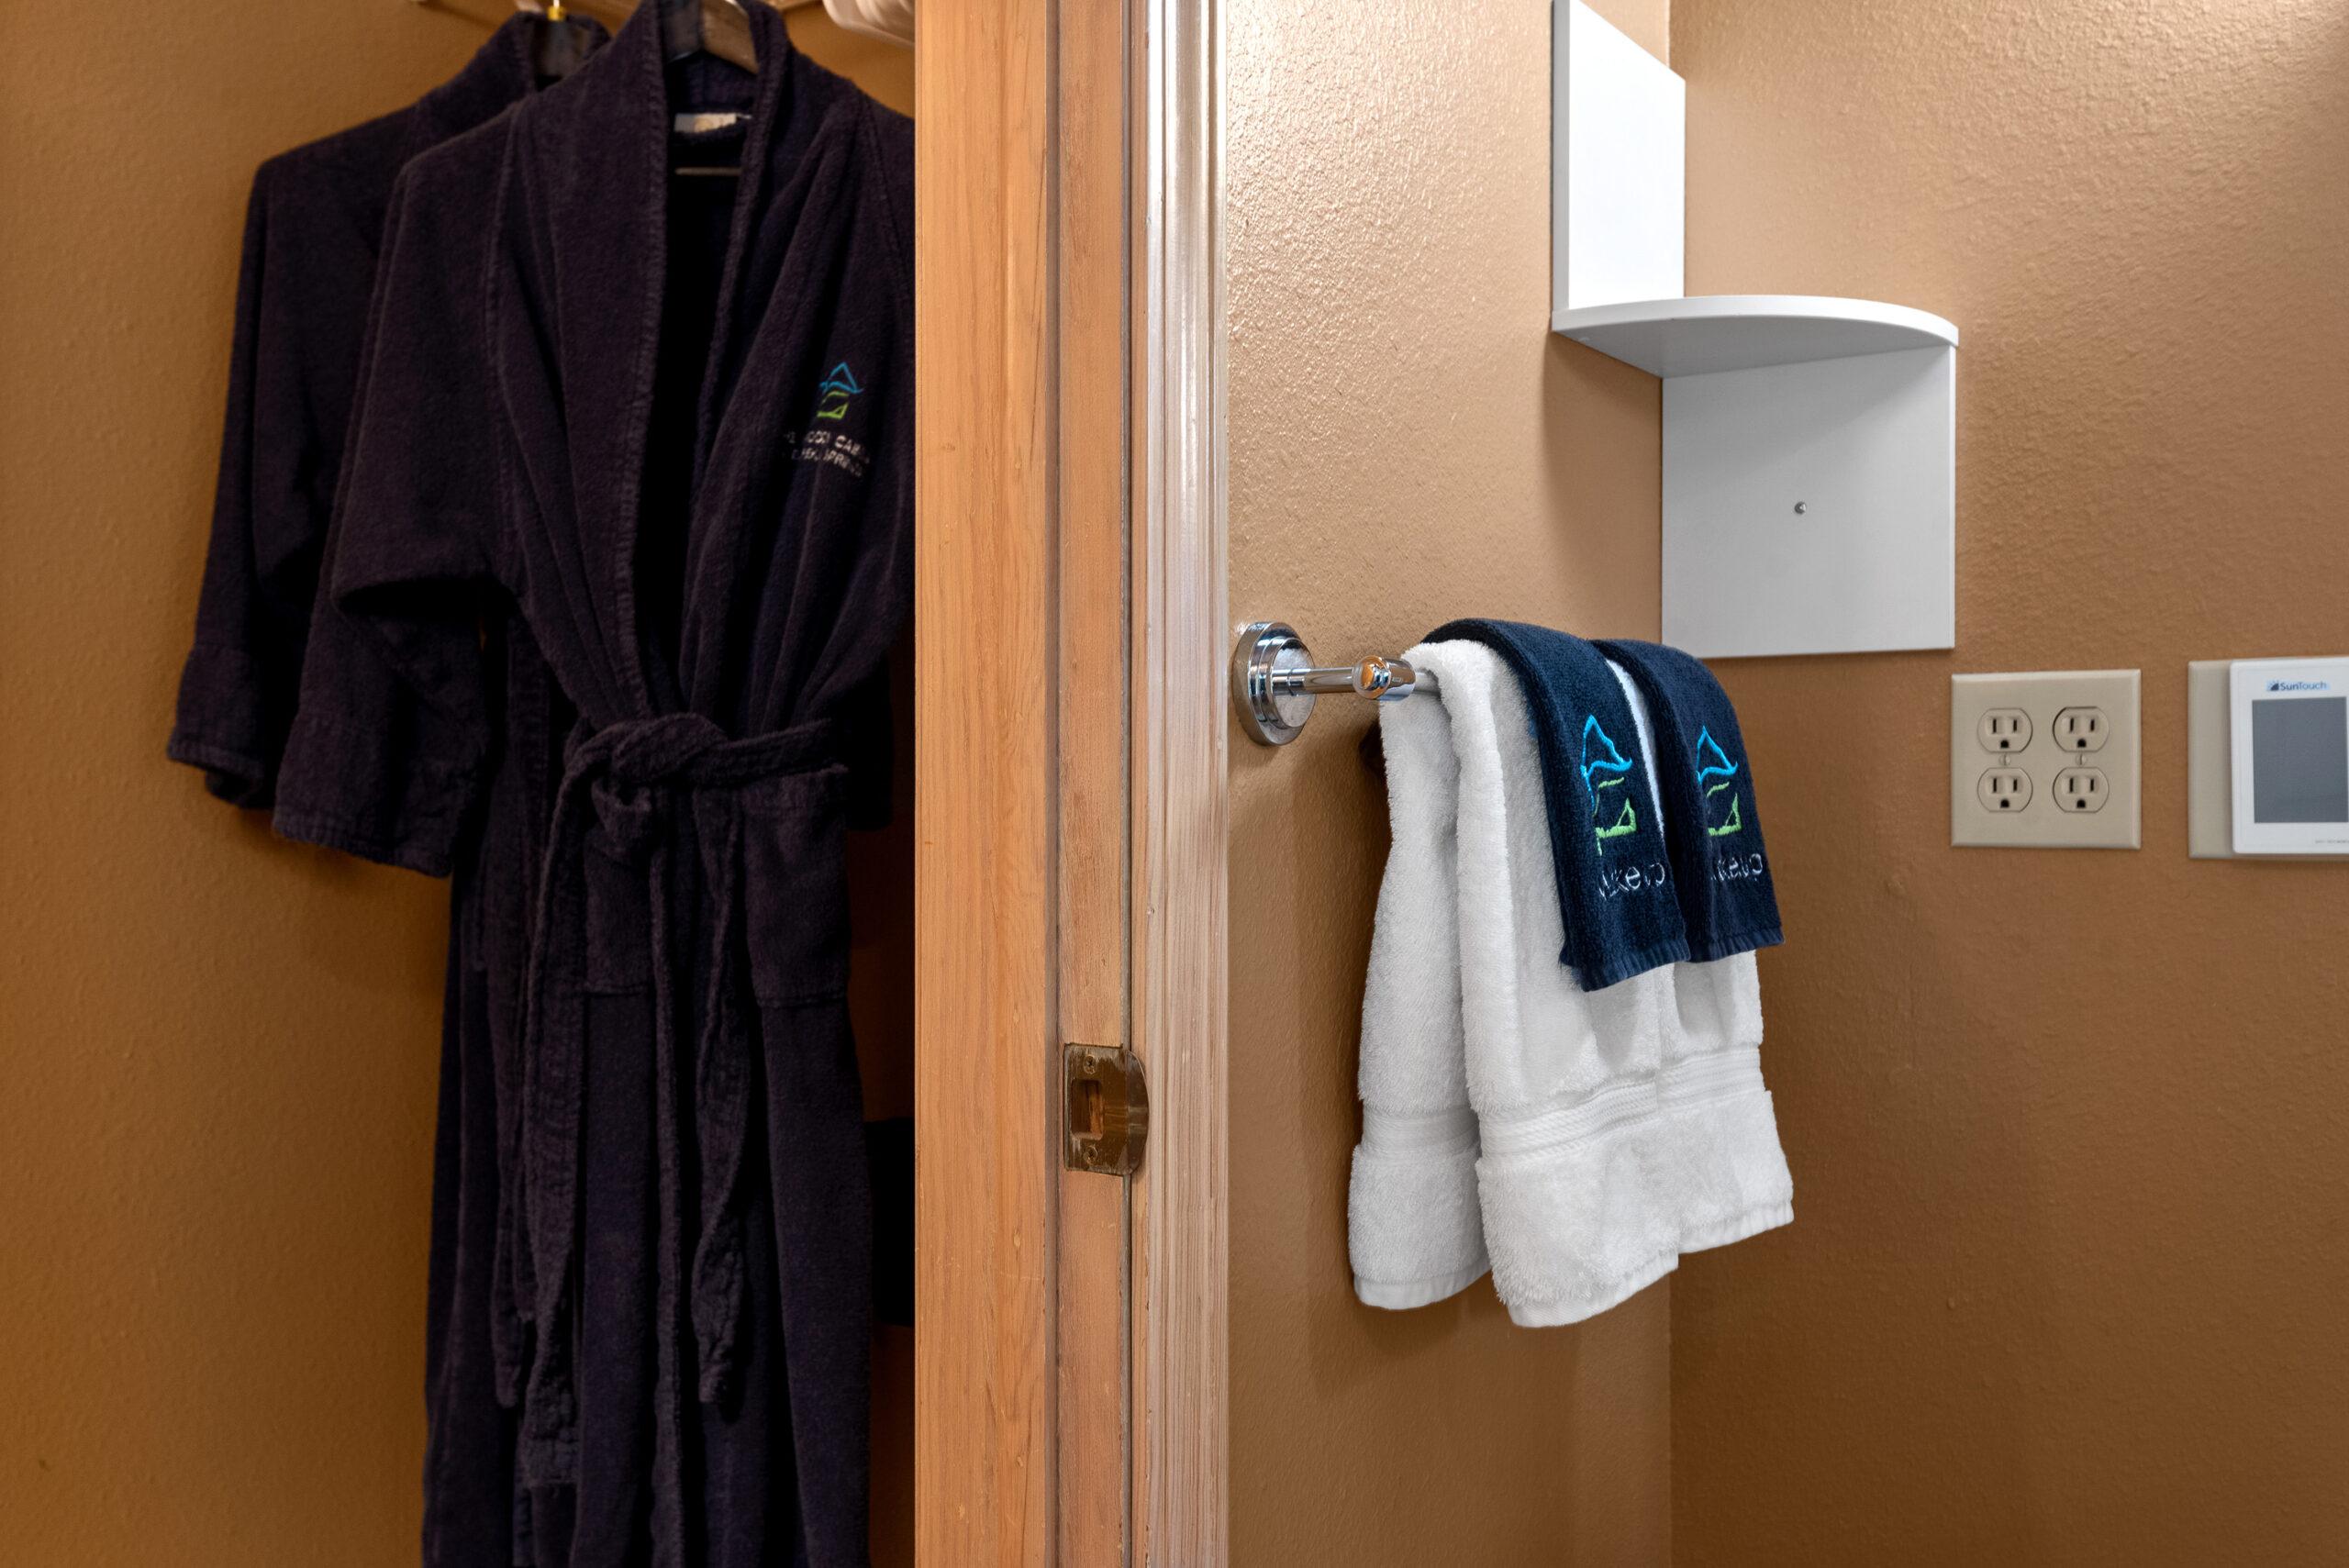 Monogramed bathrobes and makeup towels